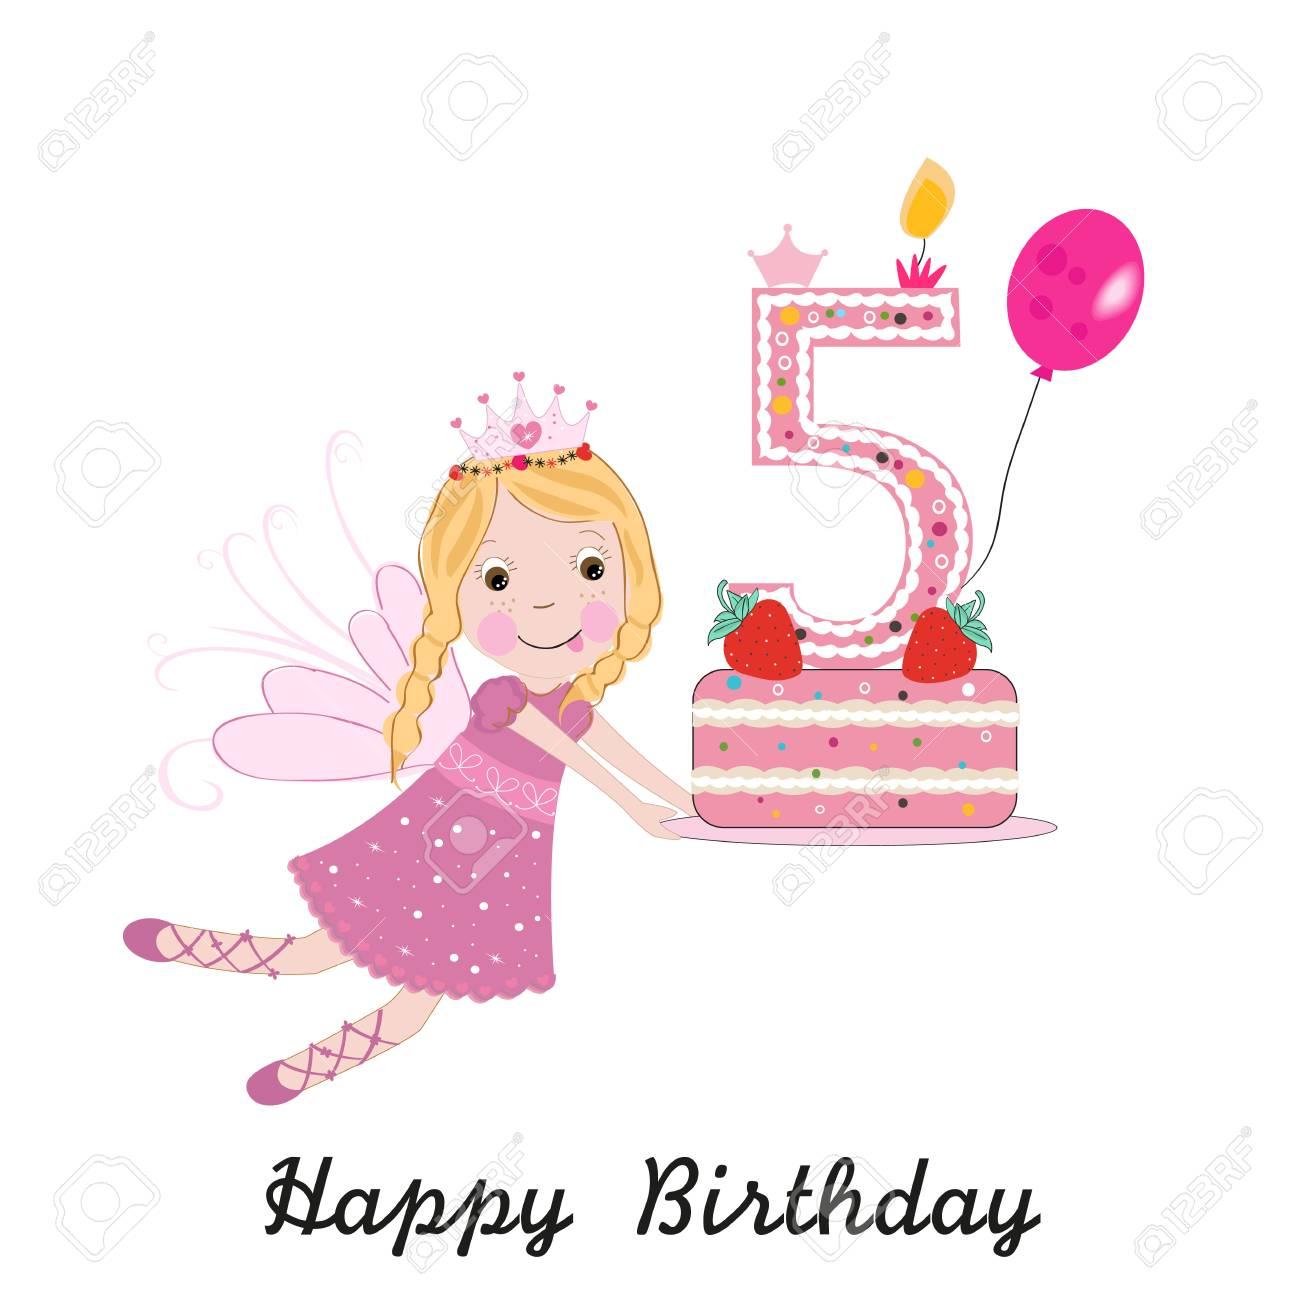 Fifth birthday greeting card. Cute fairy holding cake - 109848839